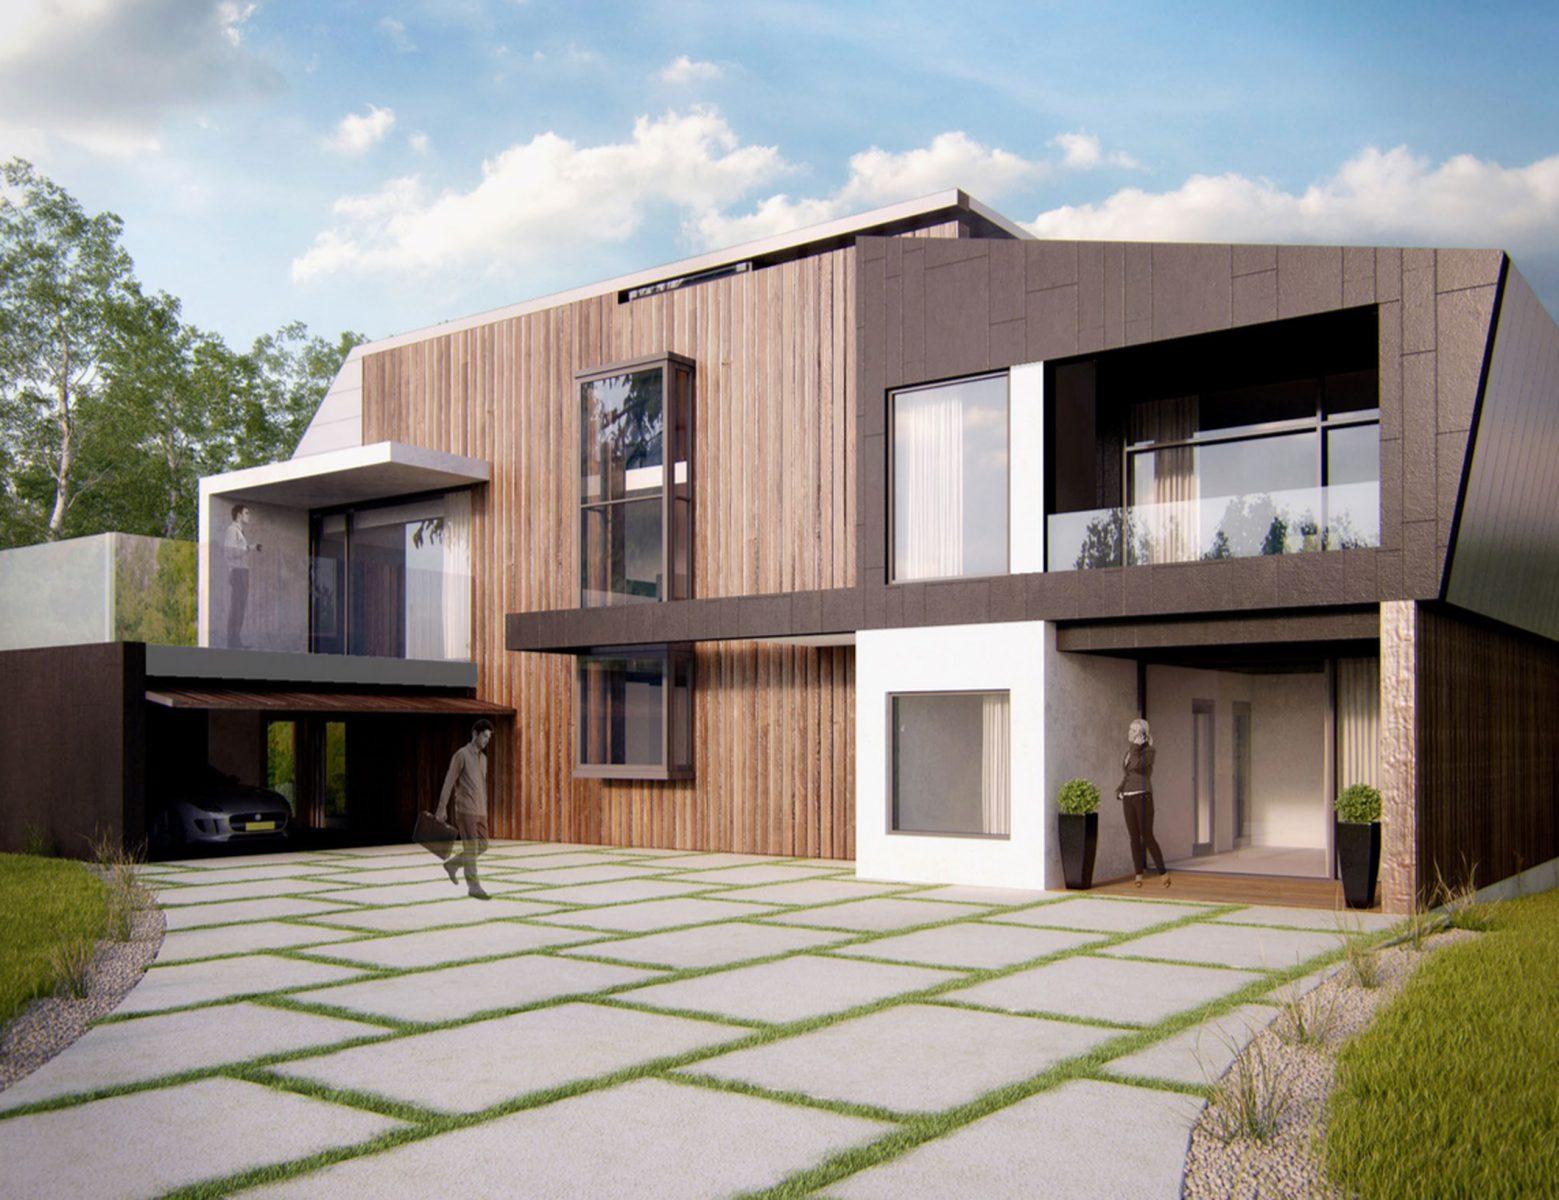 weathervane house modern architecture saundersfoot pembrokeshire architects jersey3